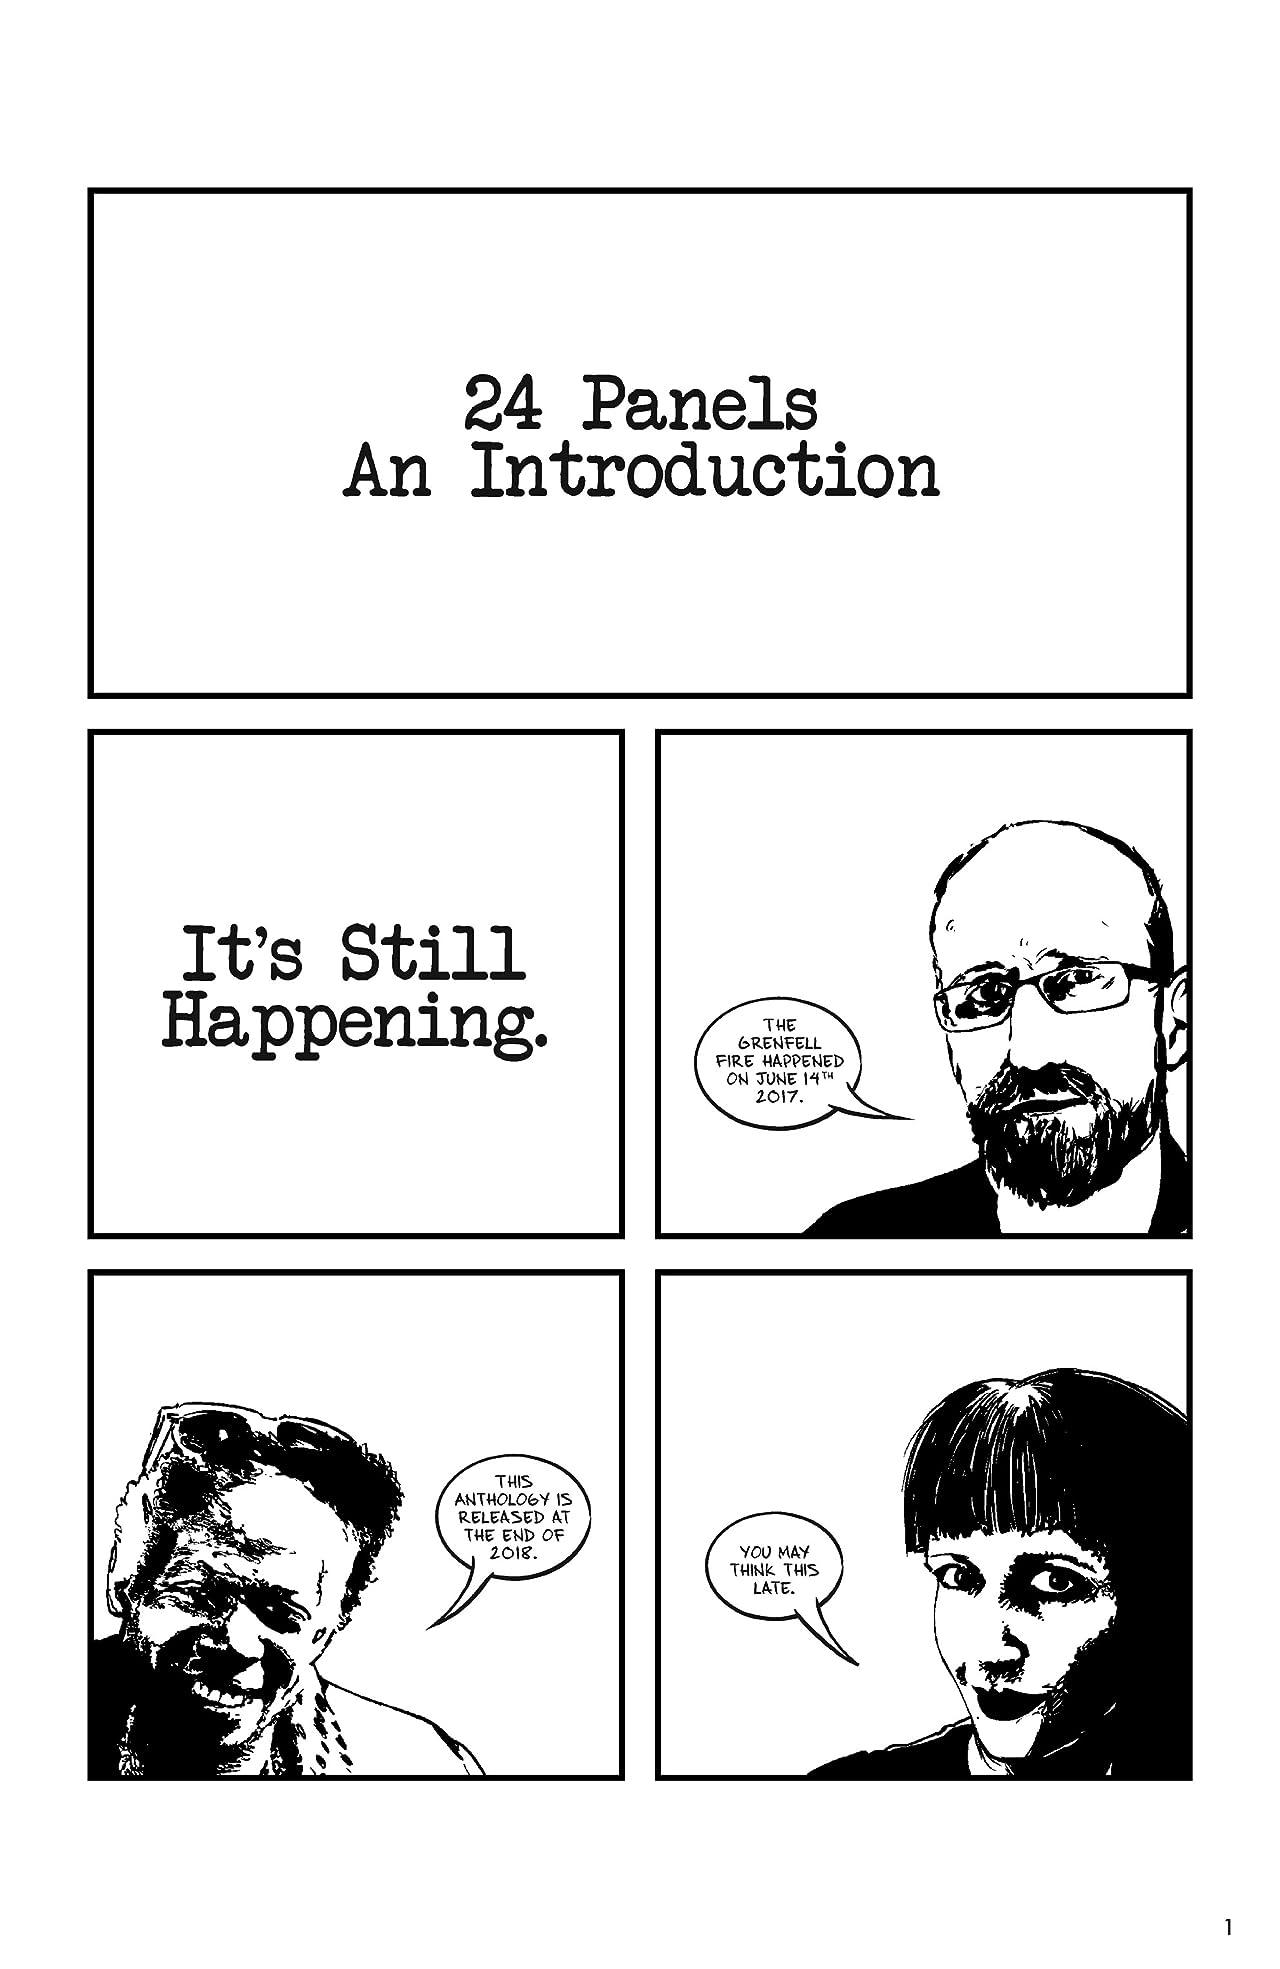 24 Panels